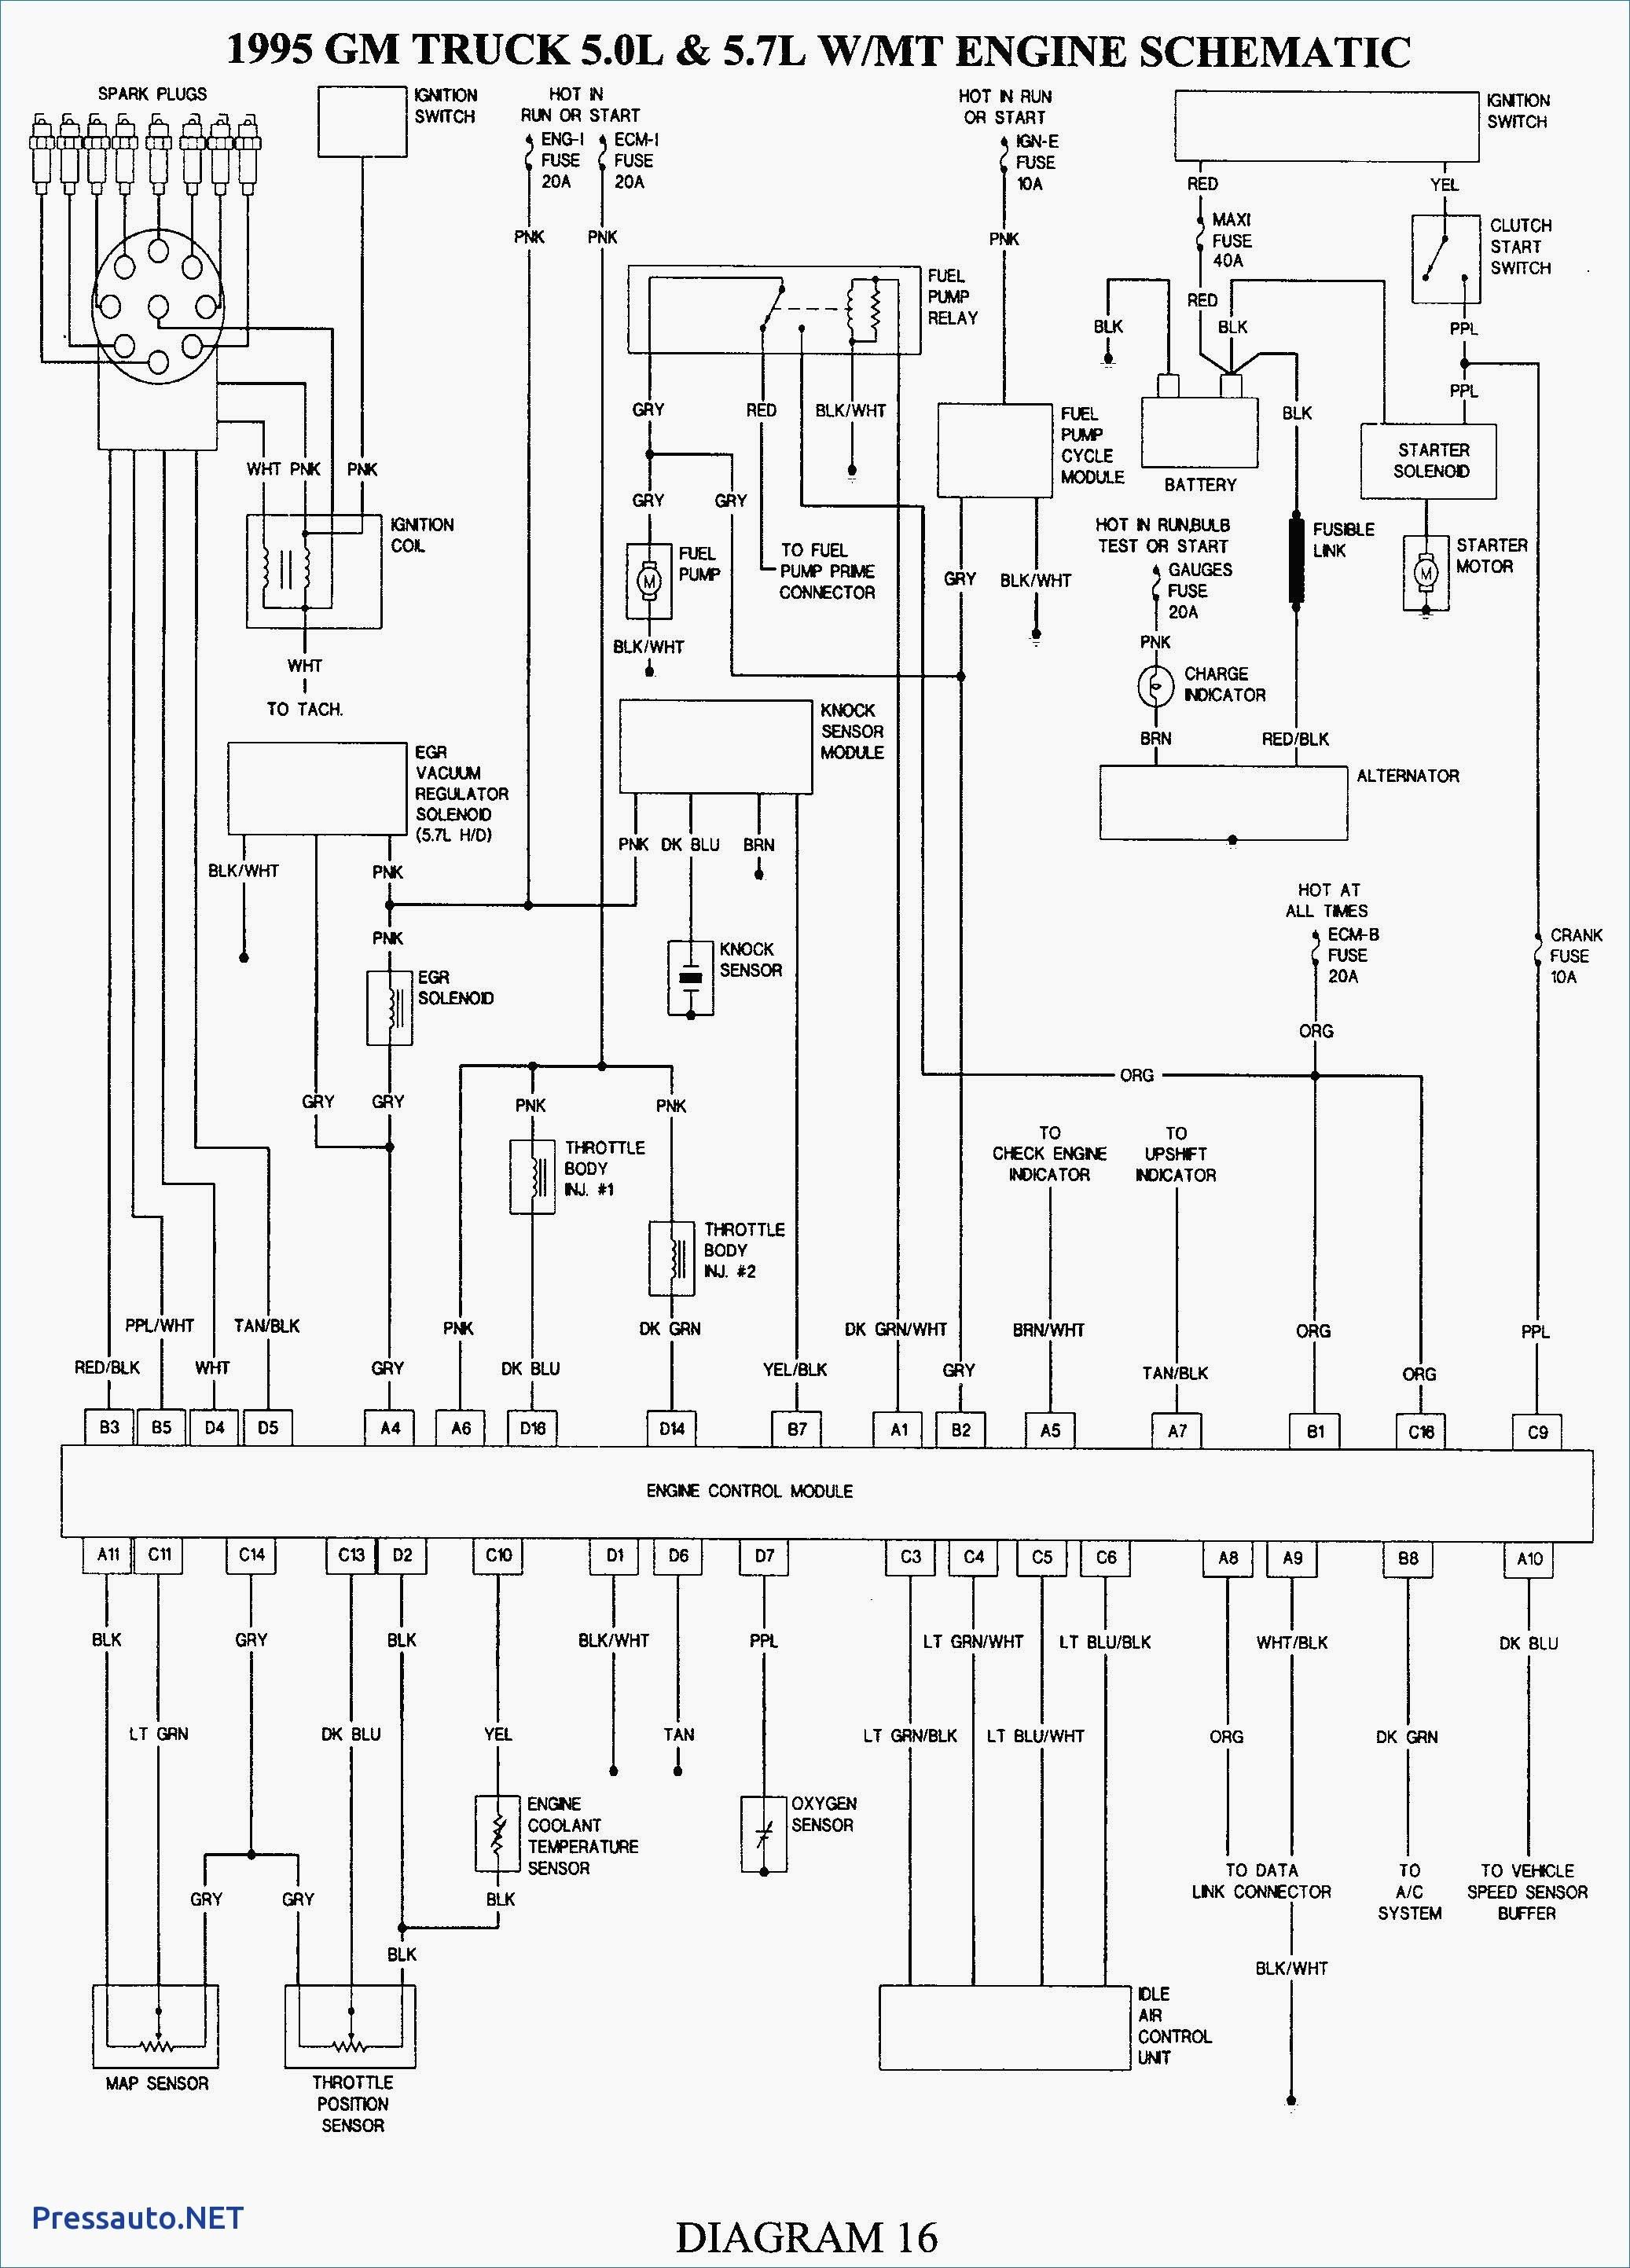 Mack R Model Wiring Diagram Fresh Elegant Cat 70 Pin Ecm Wiring Diagram Wiring